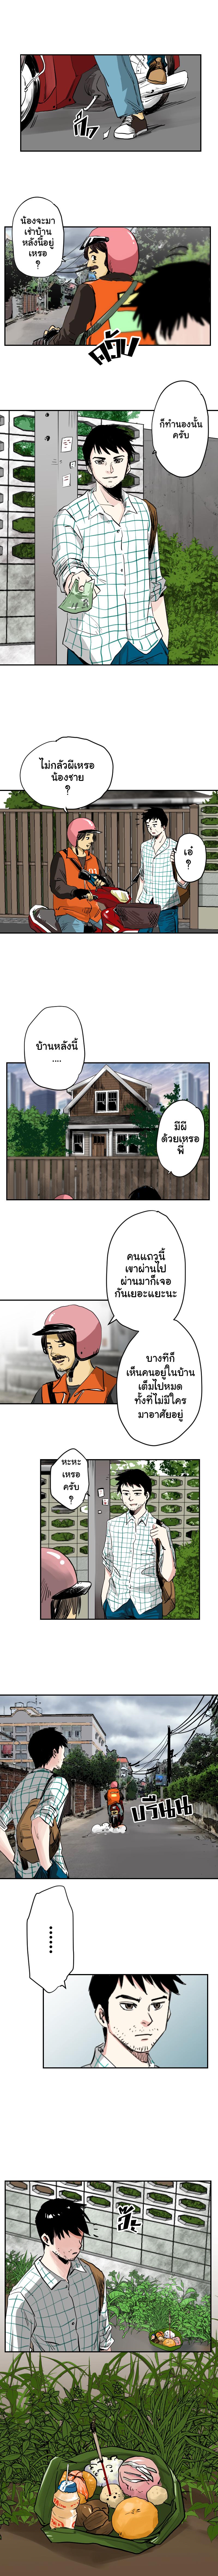 chapter 1 - กลับบ้าน